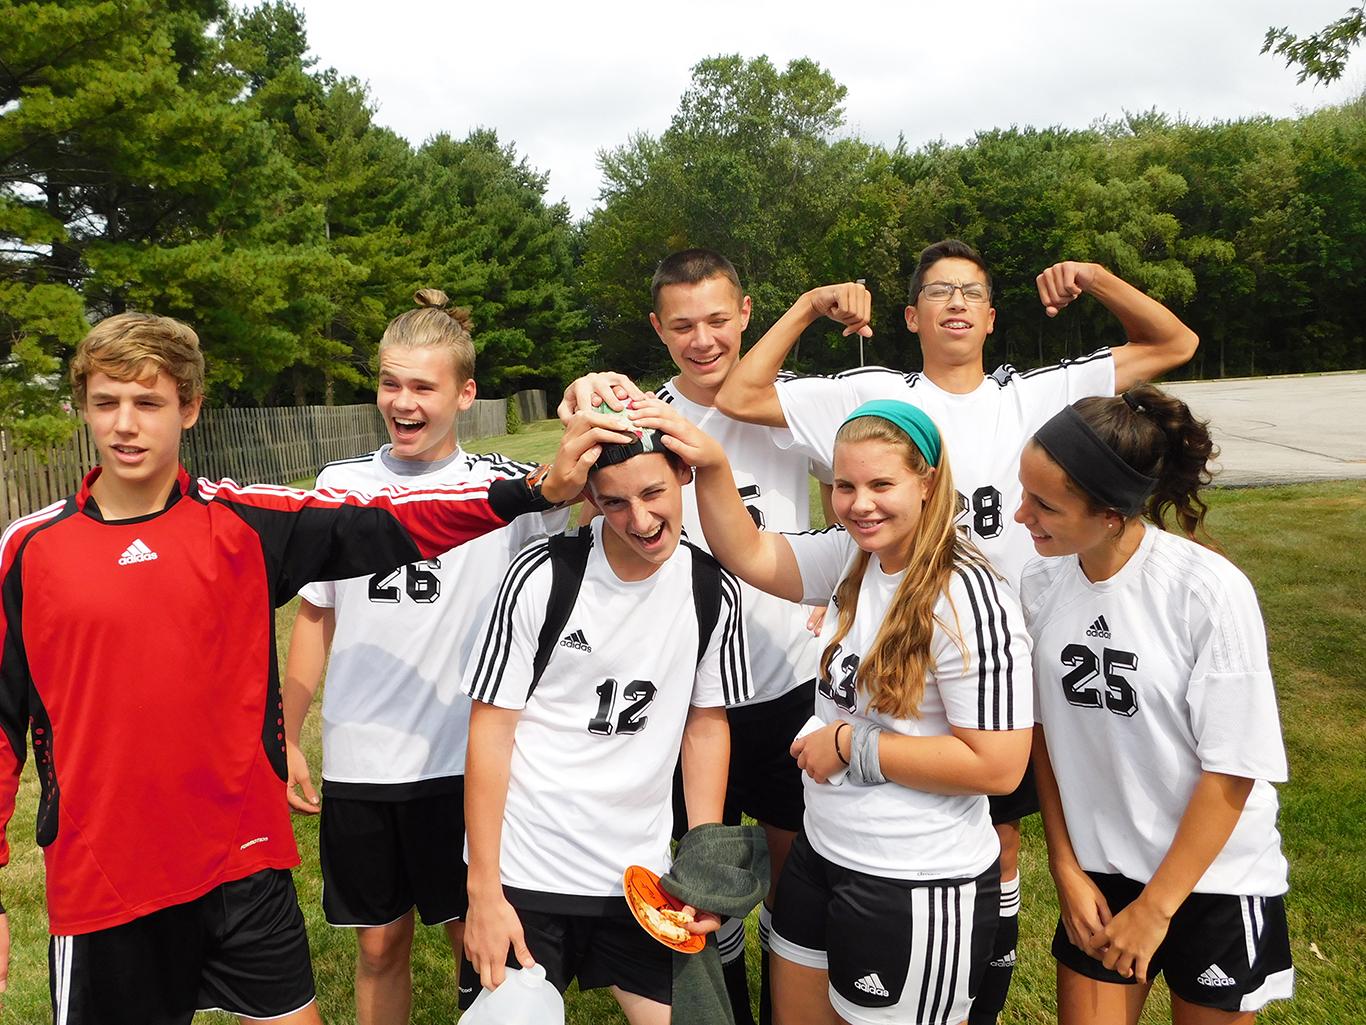 HEARTS High School Soccer Team